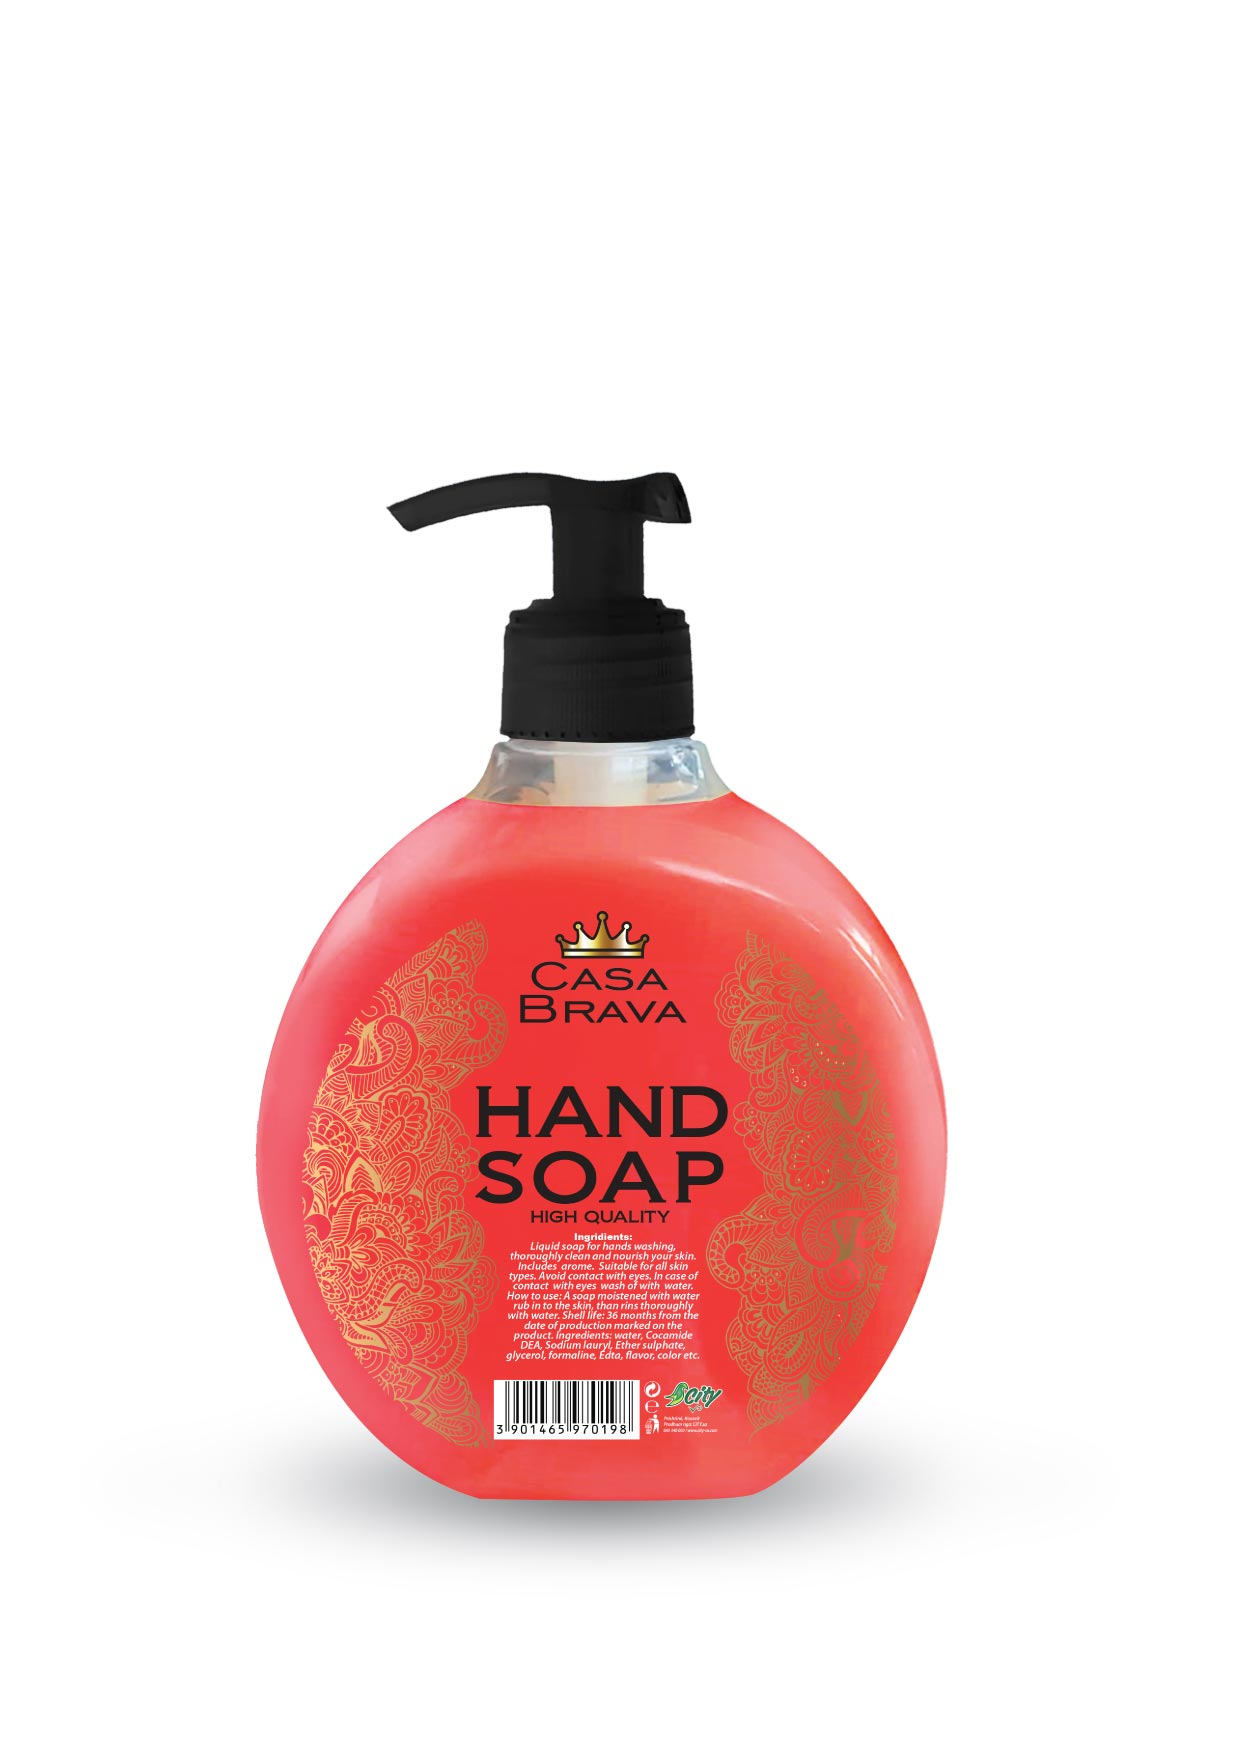 Casa-Brava-Hand-cleaner-gold-02